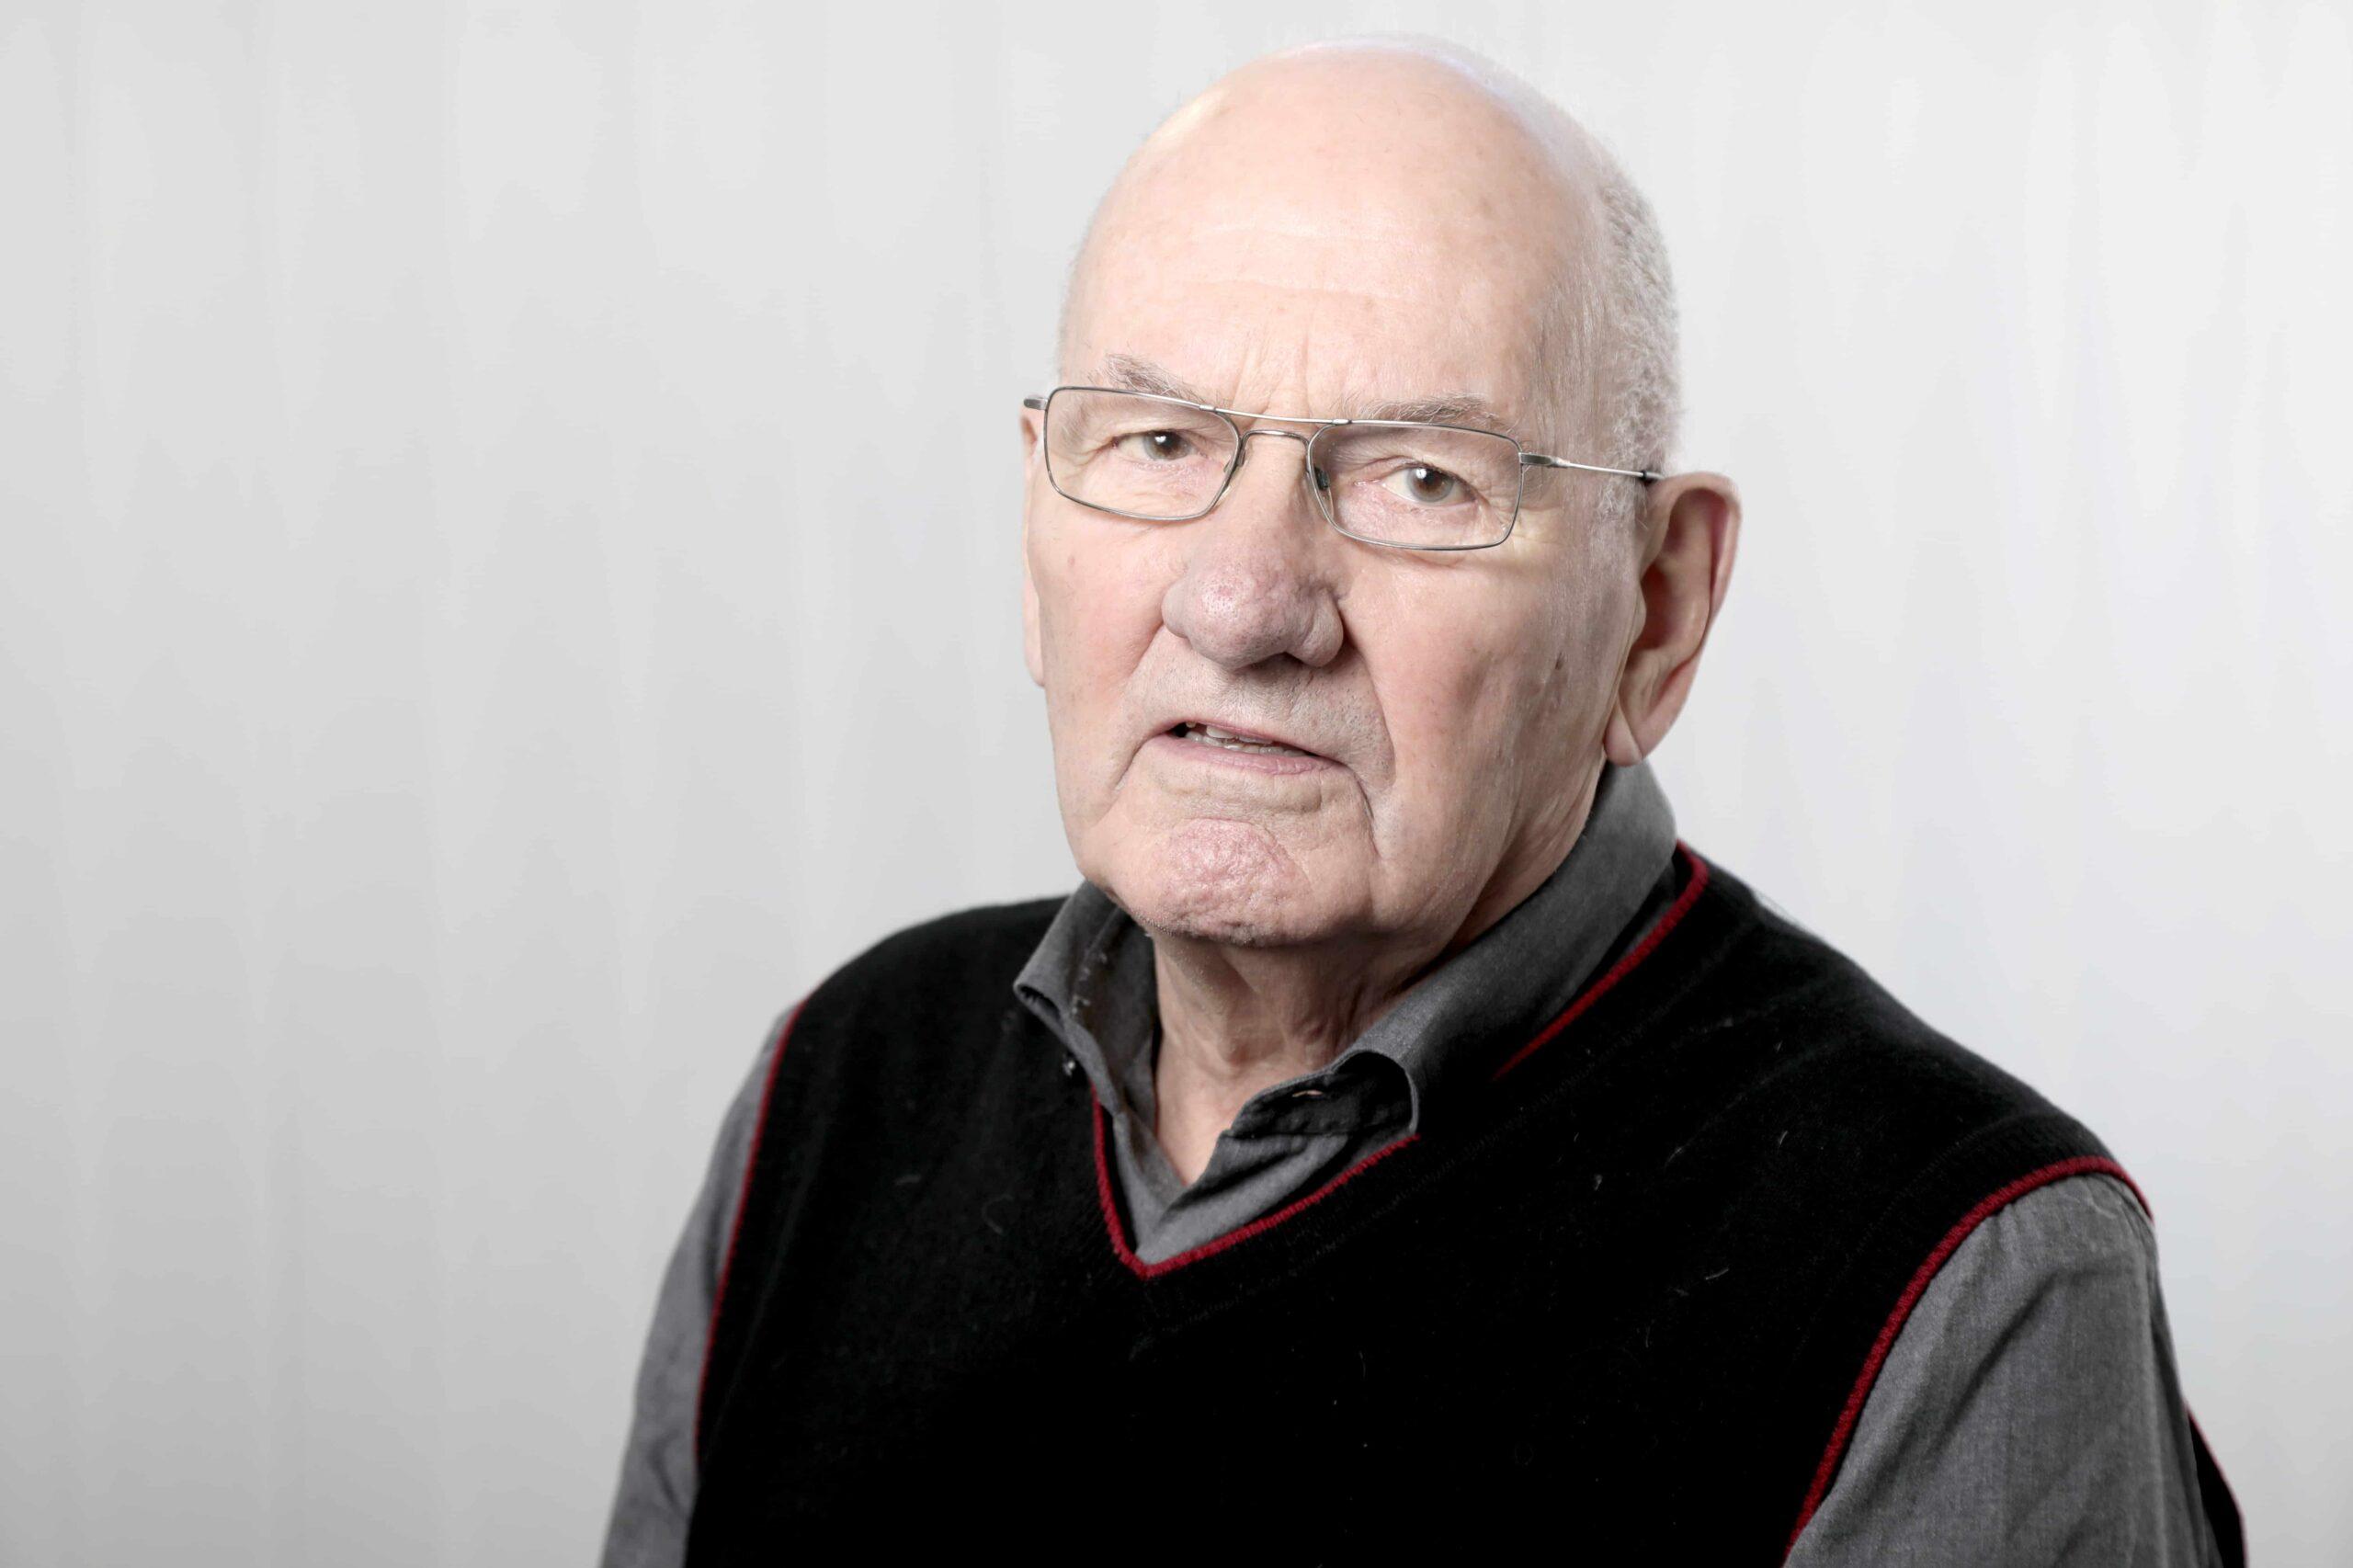 Dr. Heinz Frey